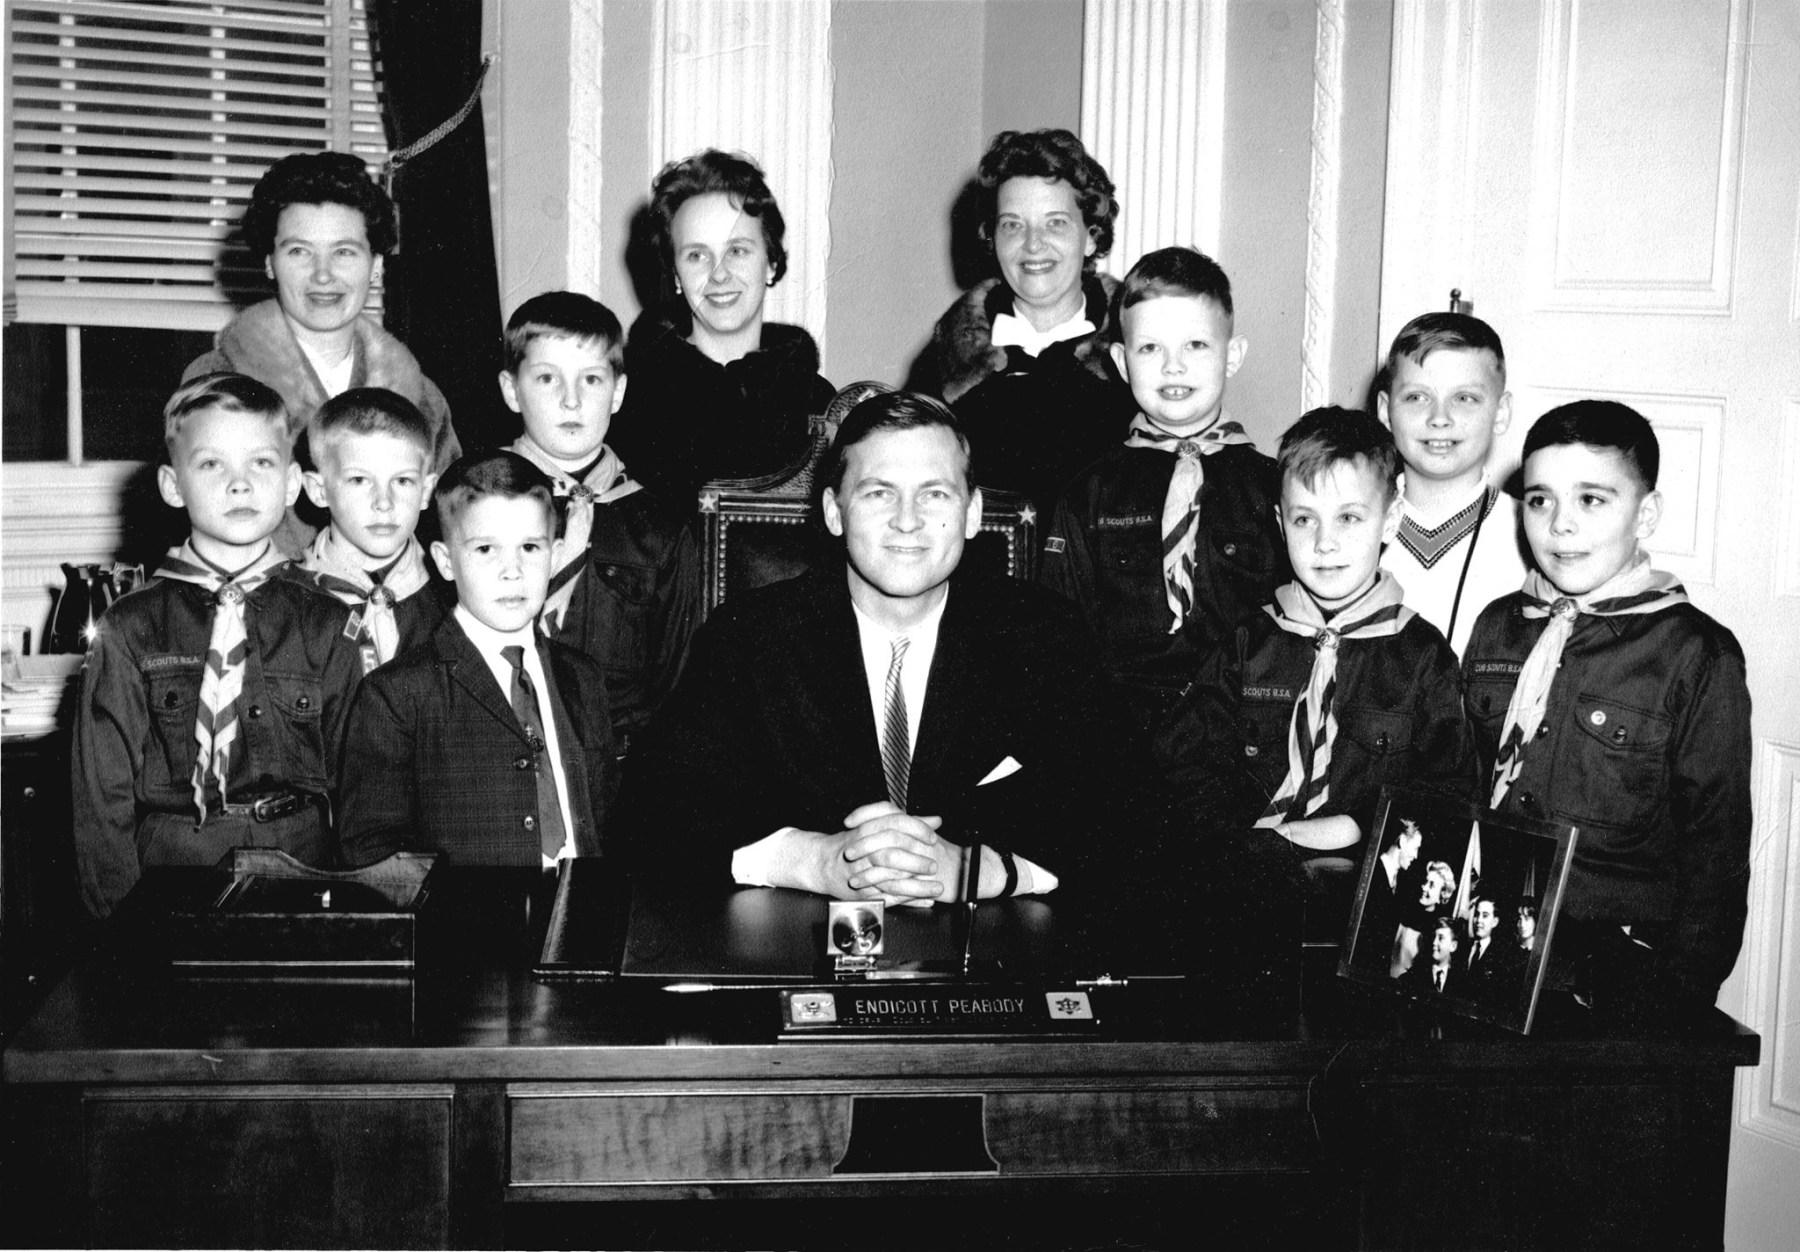 Sarah Street Boy Scouts c. 1962, Burlington MA